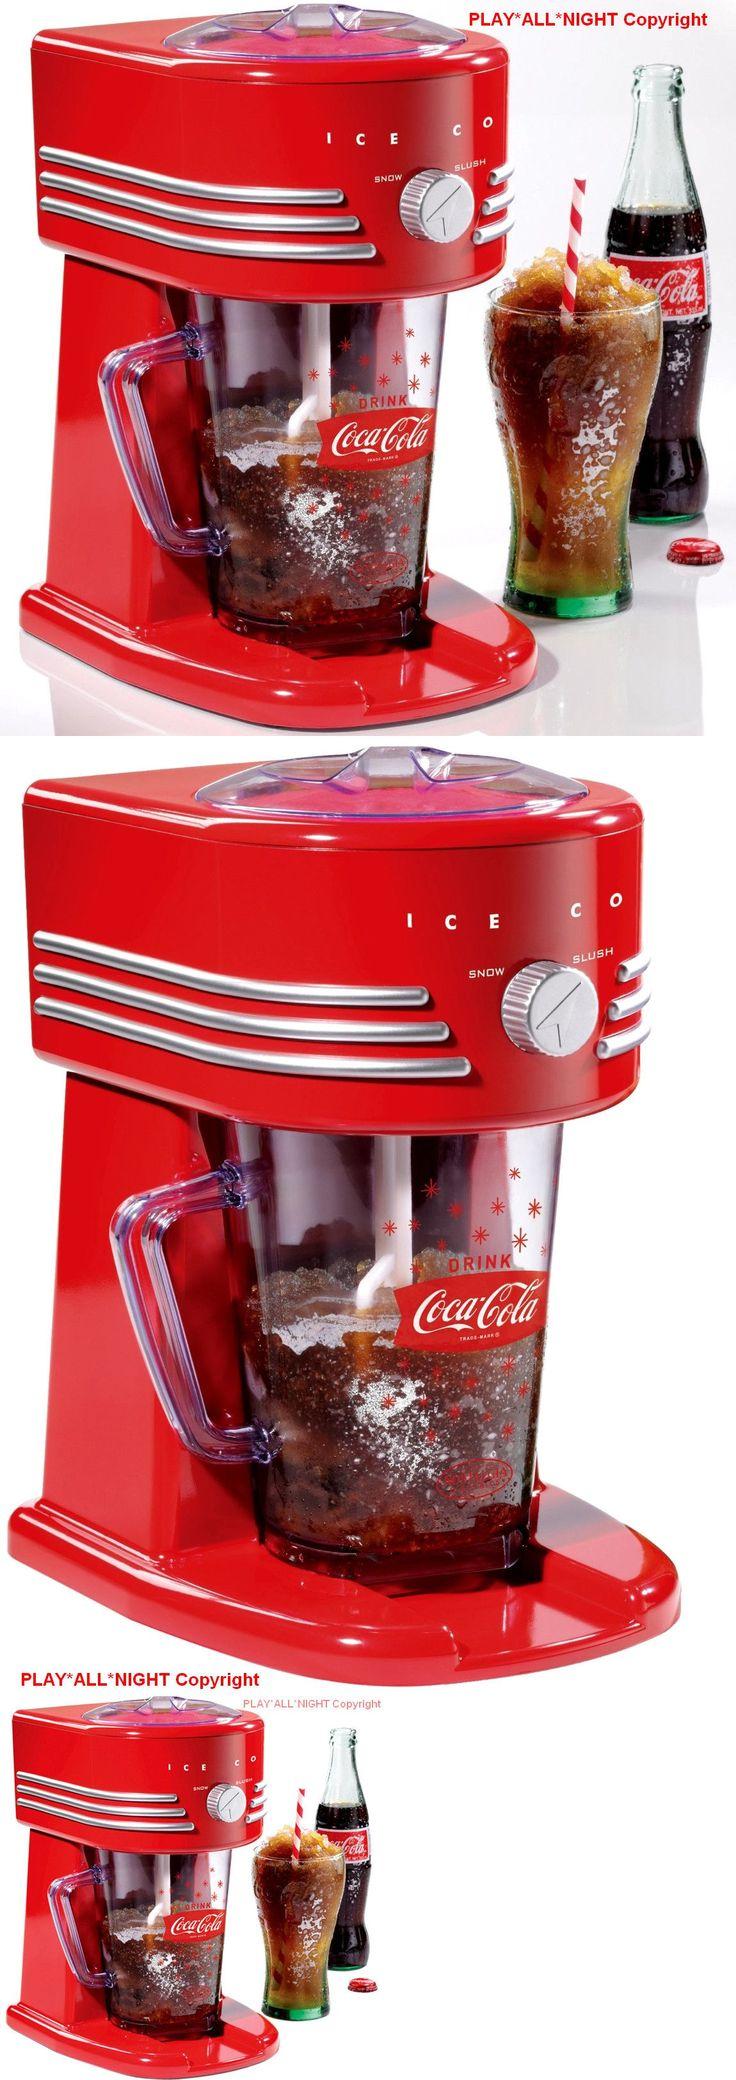 Other Small Kitchen Appliances 20685: Coca-Cola Series Frozen Slushie Drink Maker Snow Cone Slurpee Slush Ice Machine -> BUY IT NOW ONLY: $38.95 on eBay!